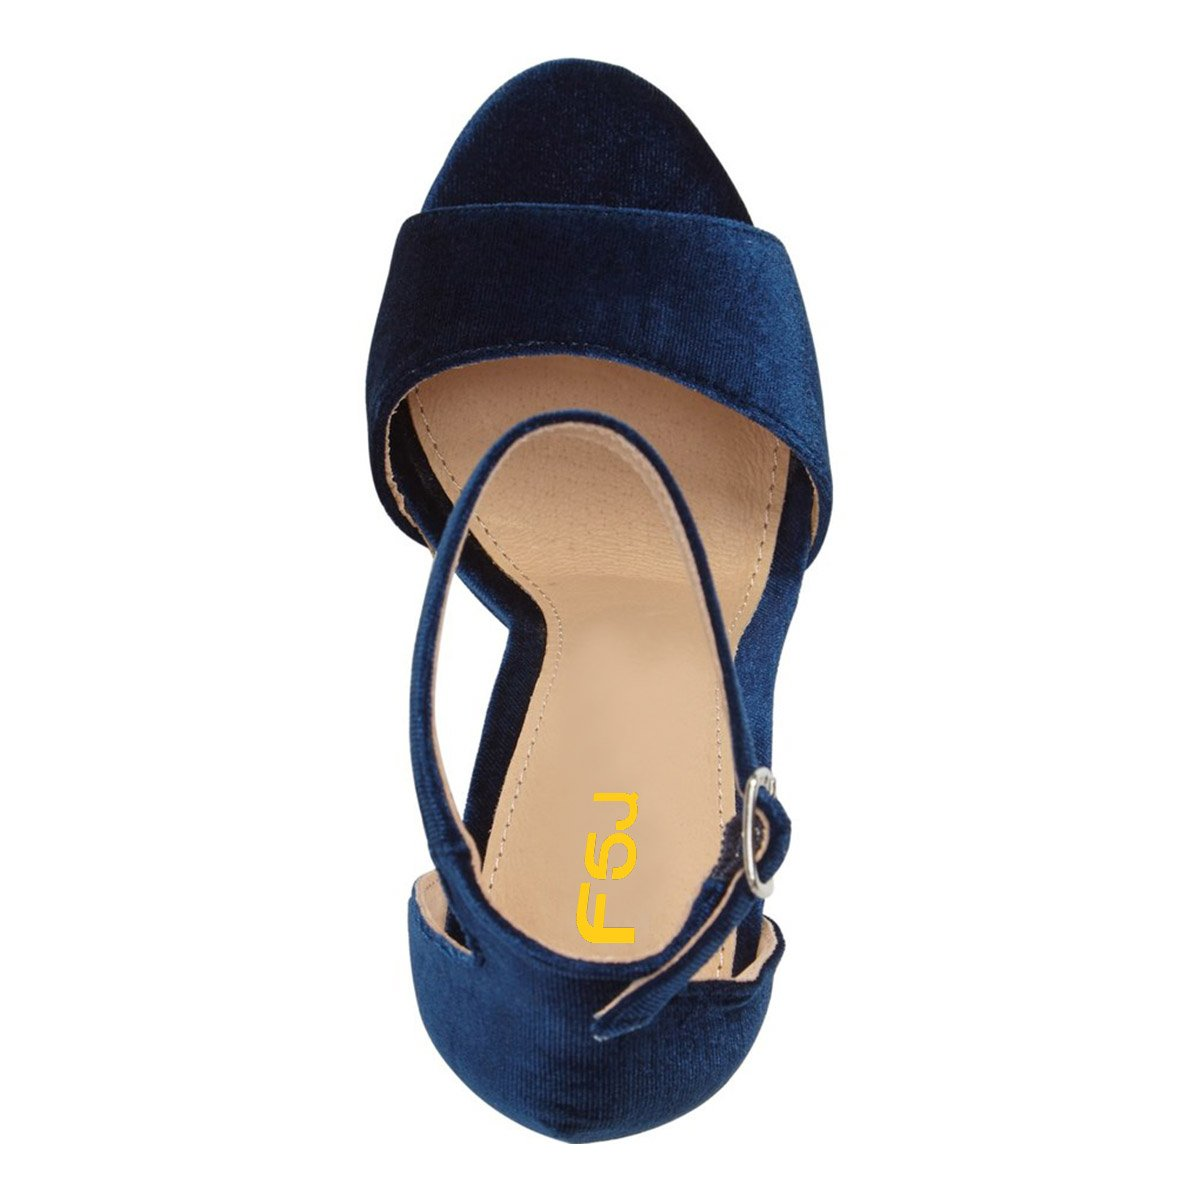 FSJ Women Sexy Ankle Strap Platform Sandals Chunky High Heel Open Toe Velvet Shoes Size 4-15 US B0786DG9Z1 8 B(M) US|Navy Blue